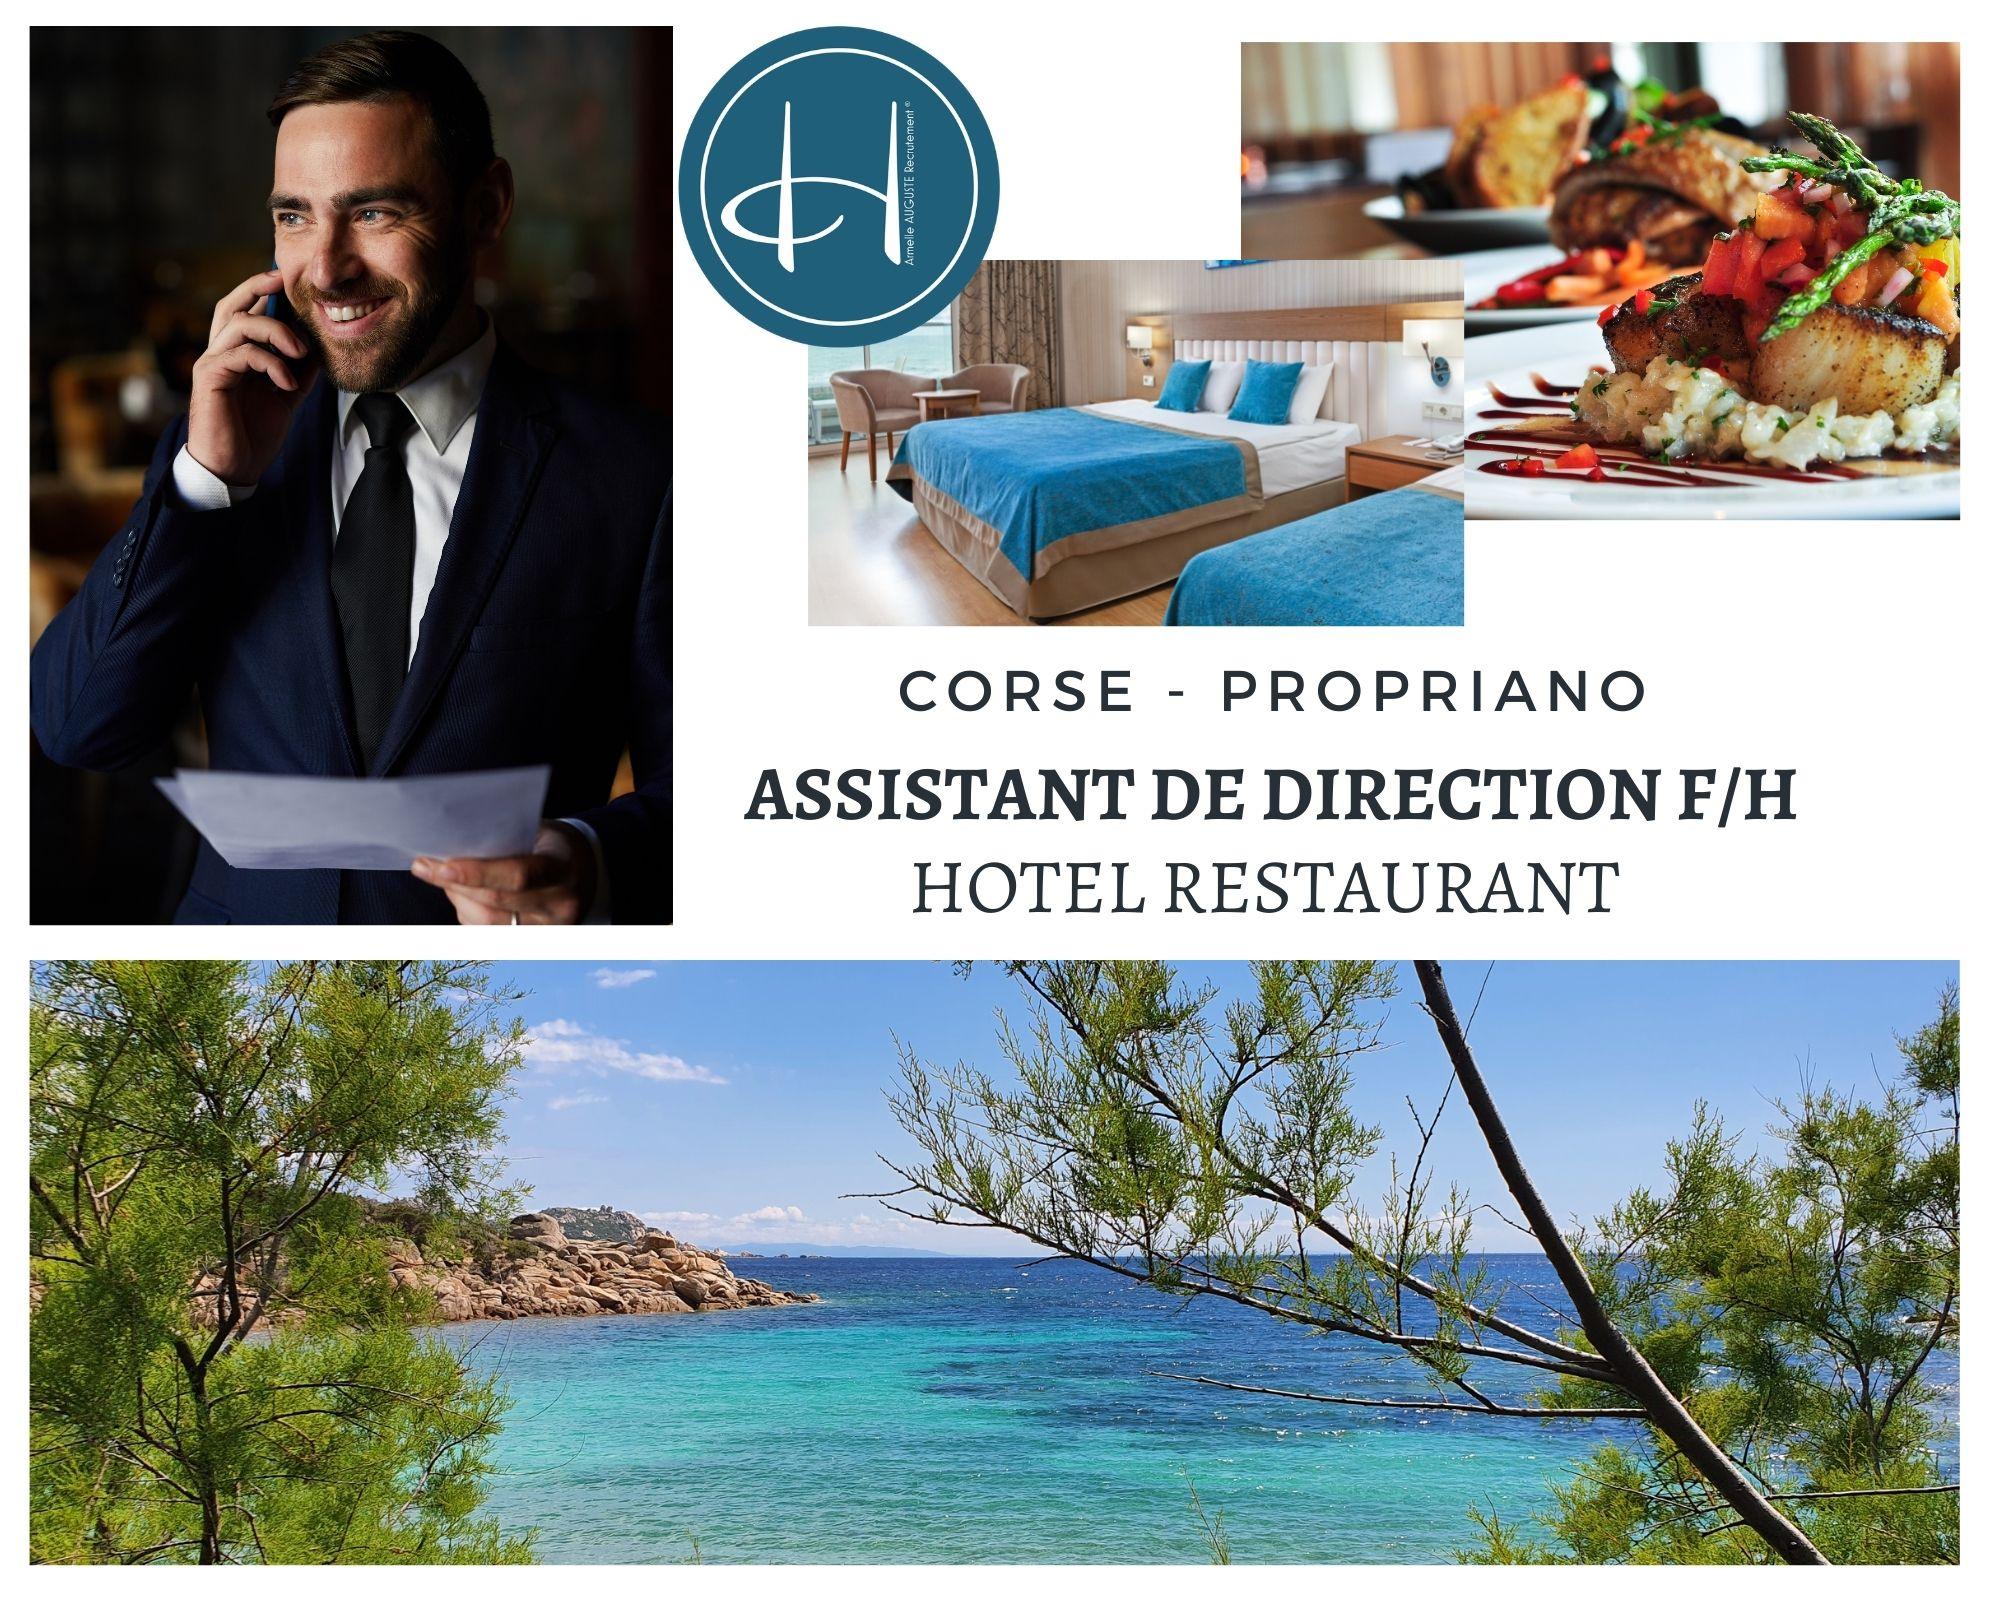 Recrutement: Adjoint de Direction restauration - Hôtel restaurant F/H chez Armelle AUGUSTE Recrutement® à Propriano